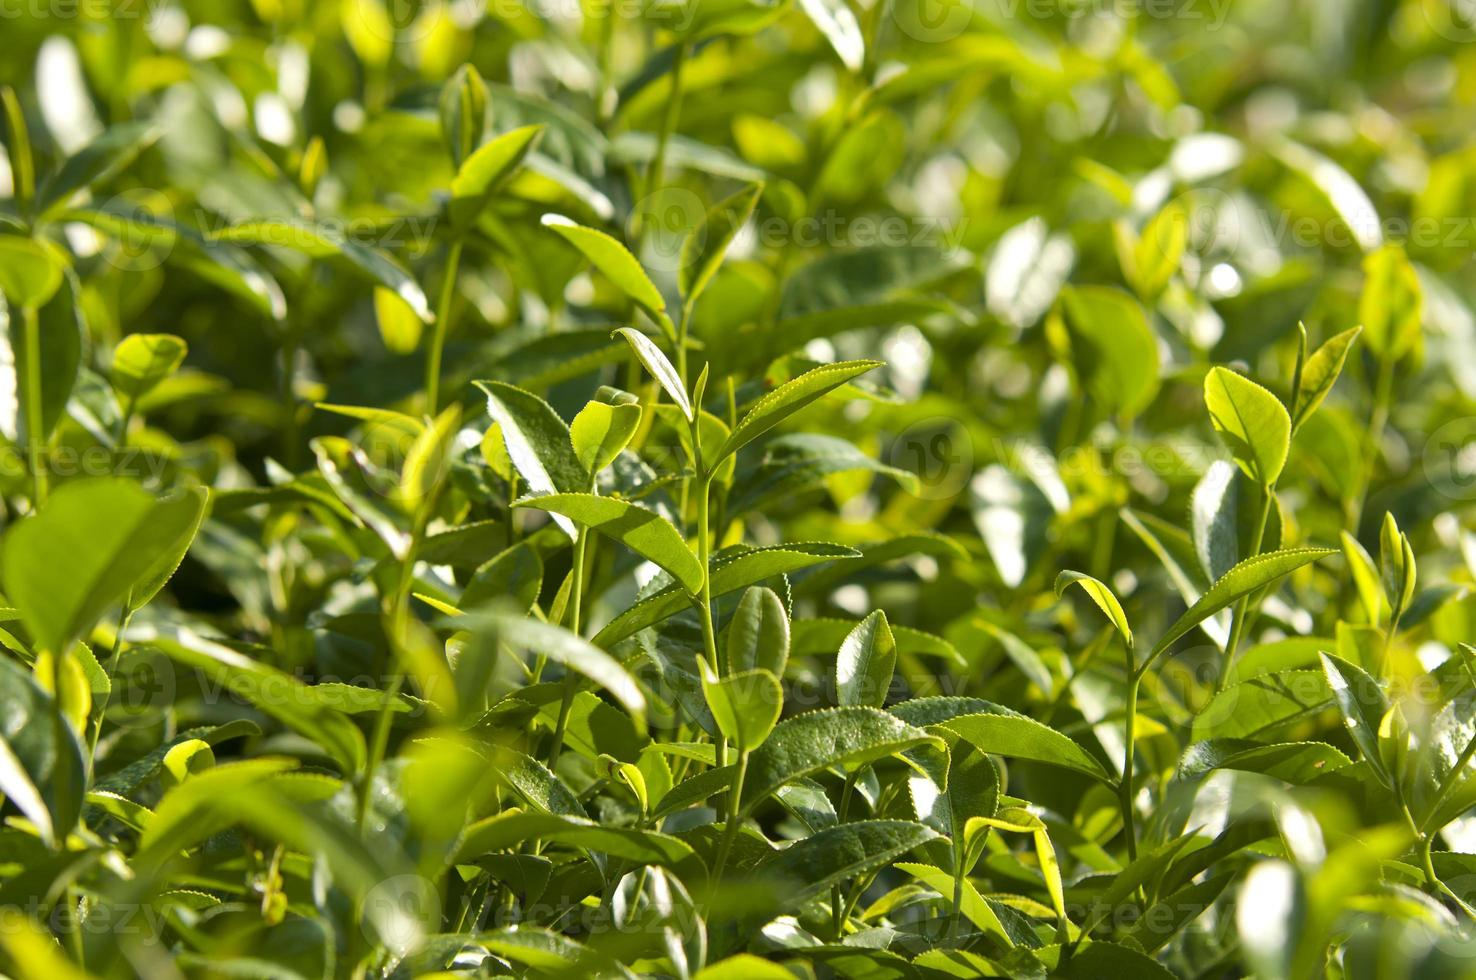 árvore de chá oolong asiático foto